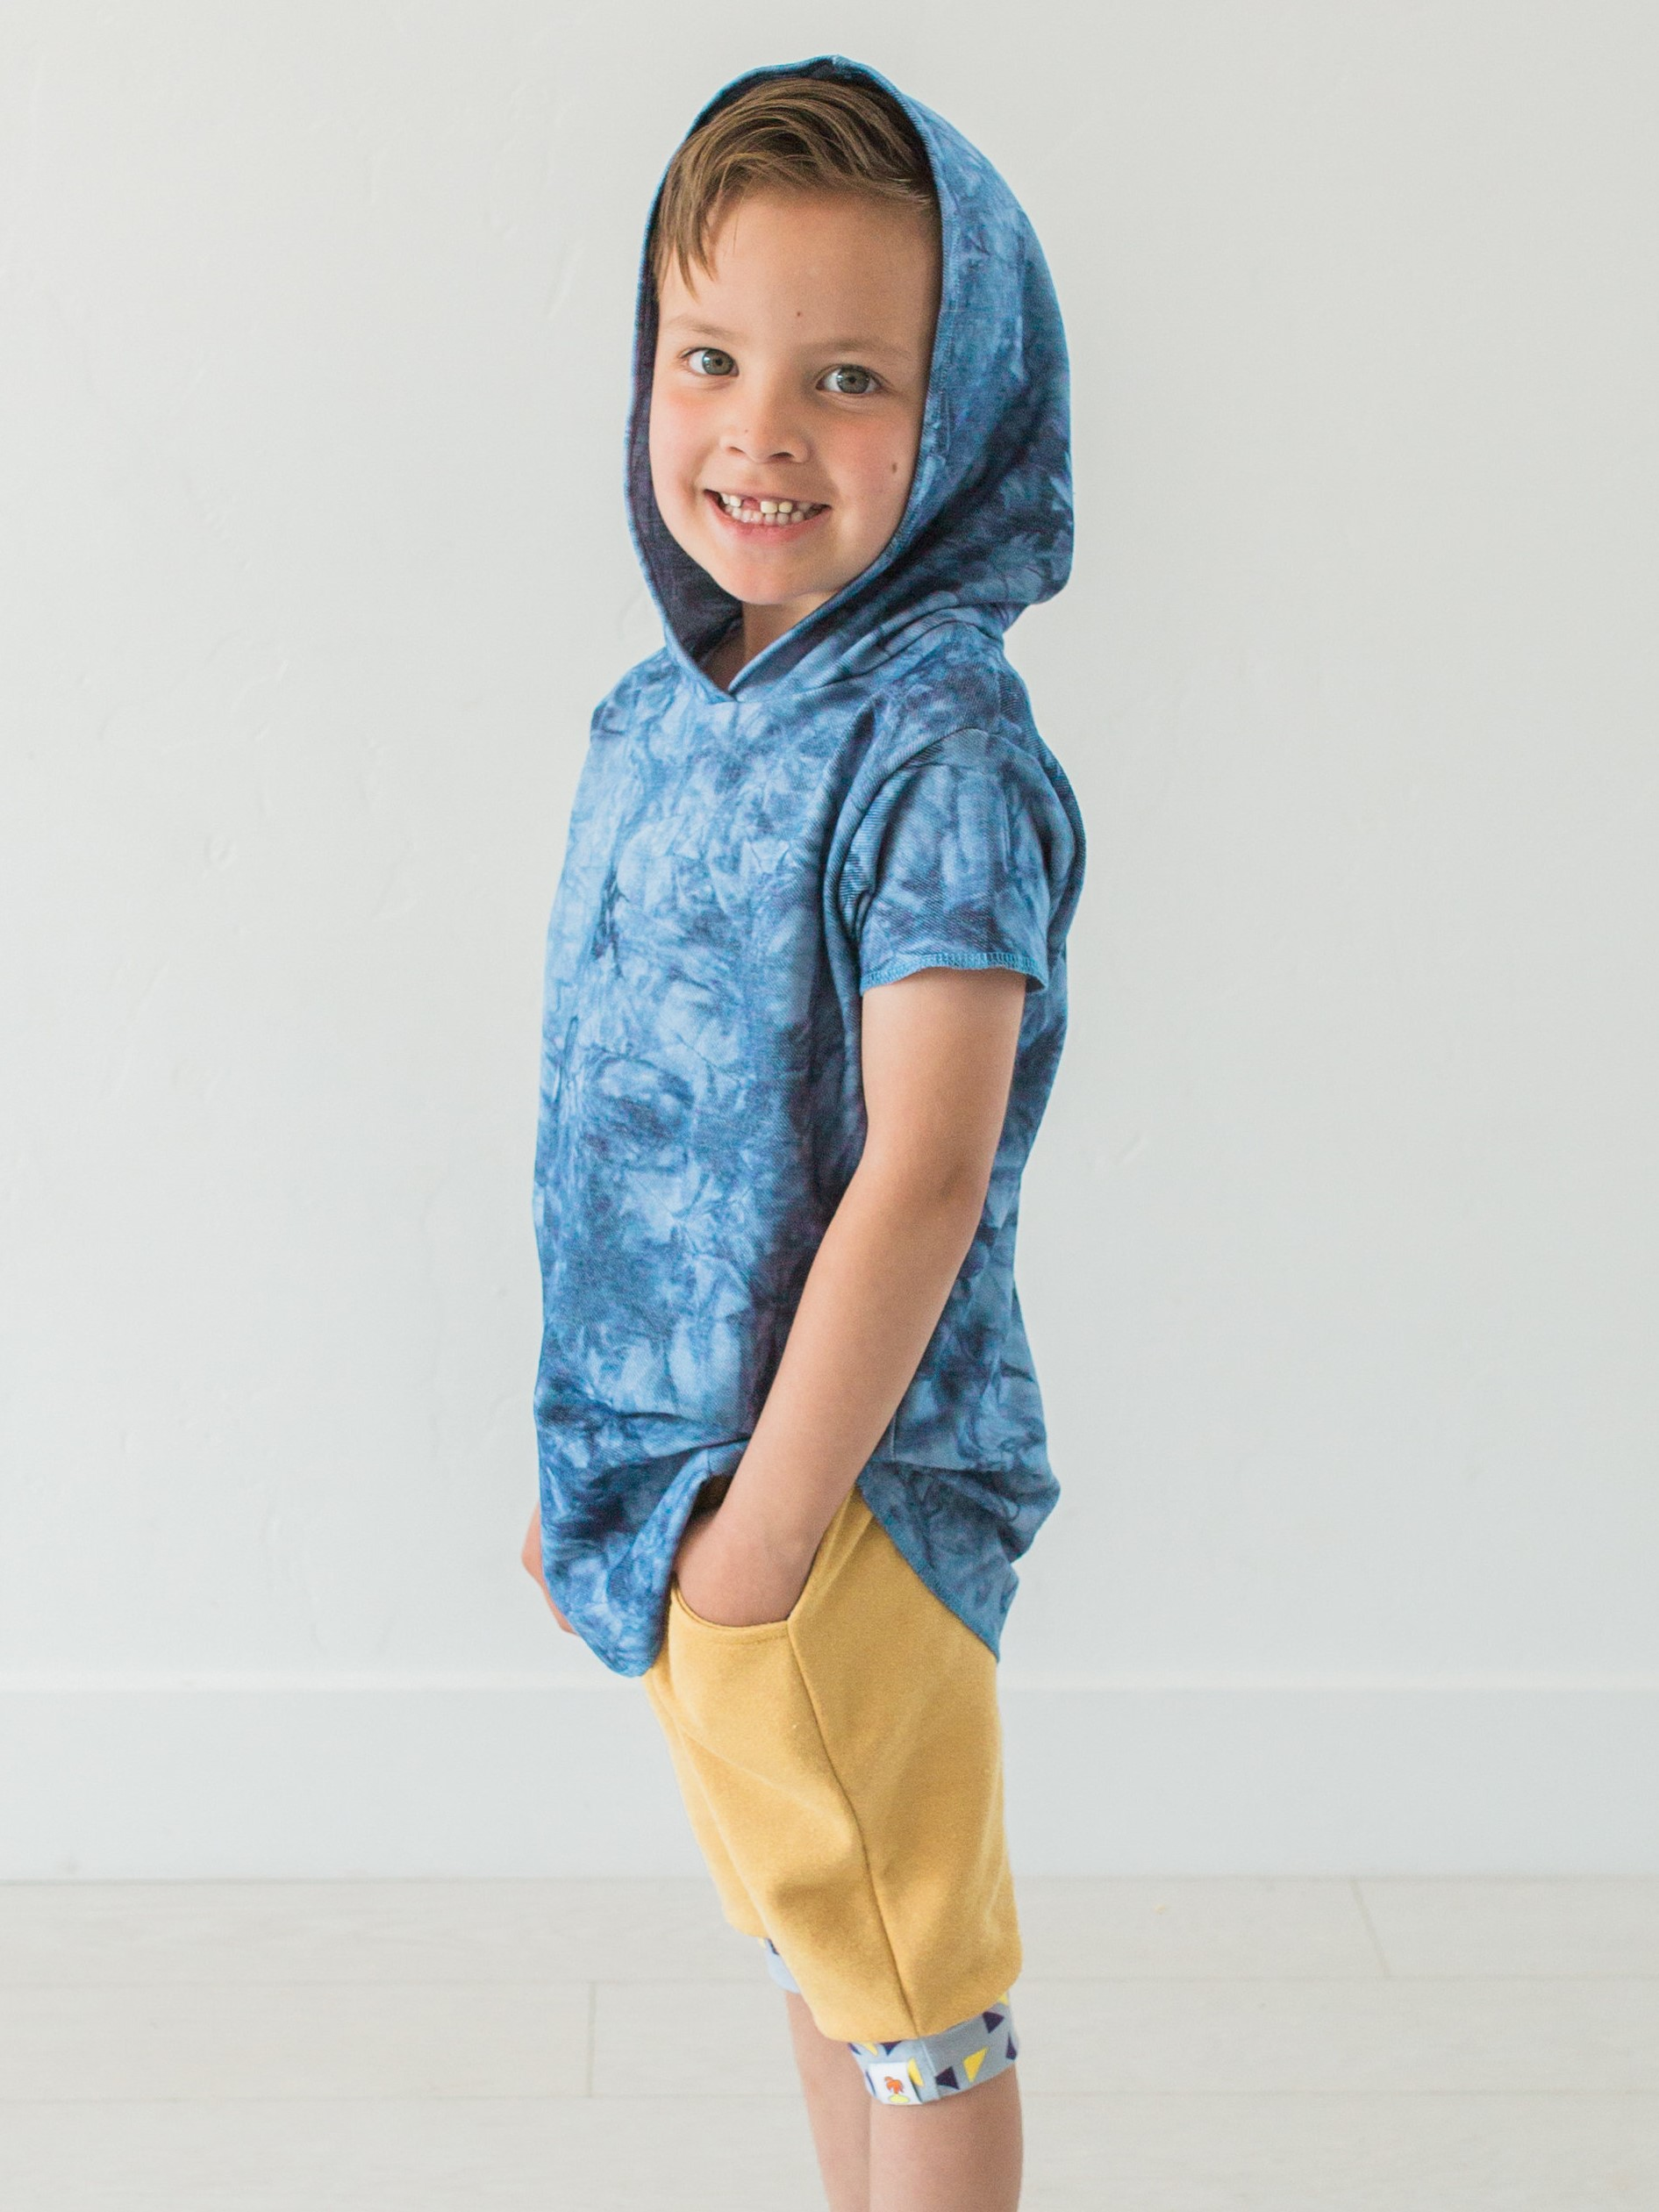 PARADISE KIDS CLOTHING-0460.jpg